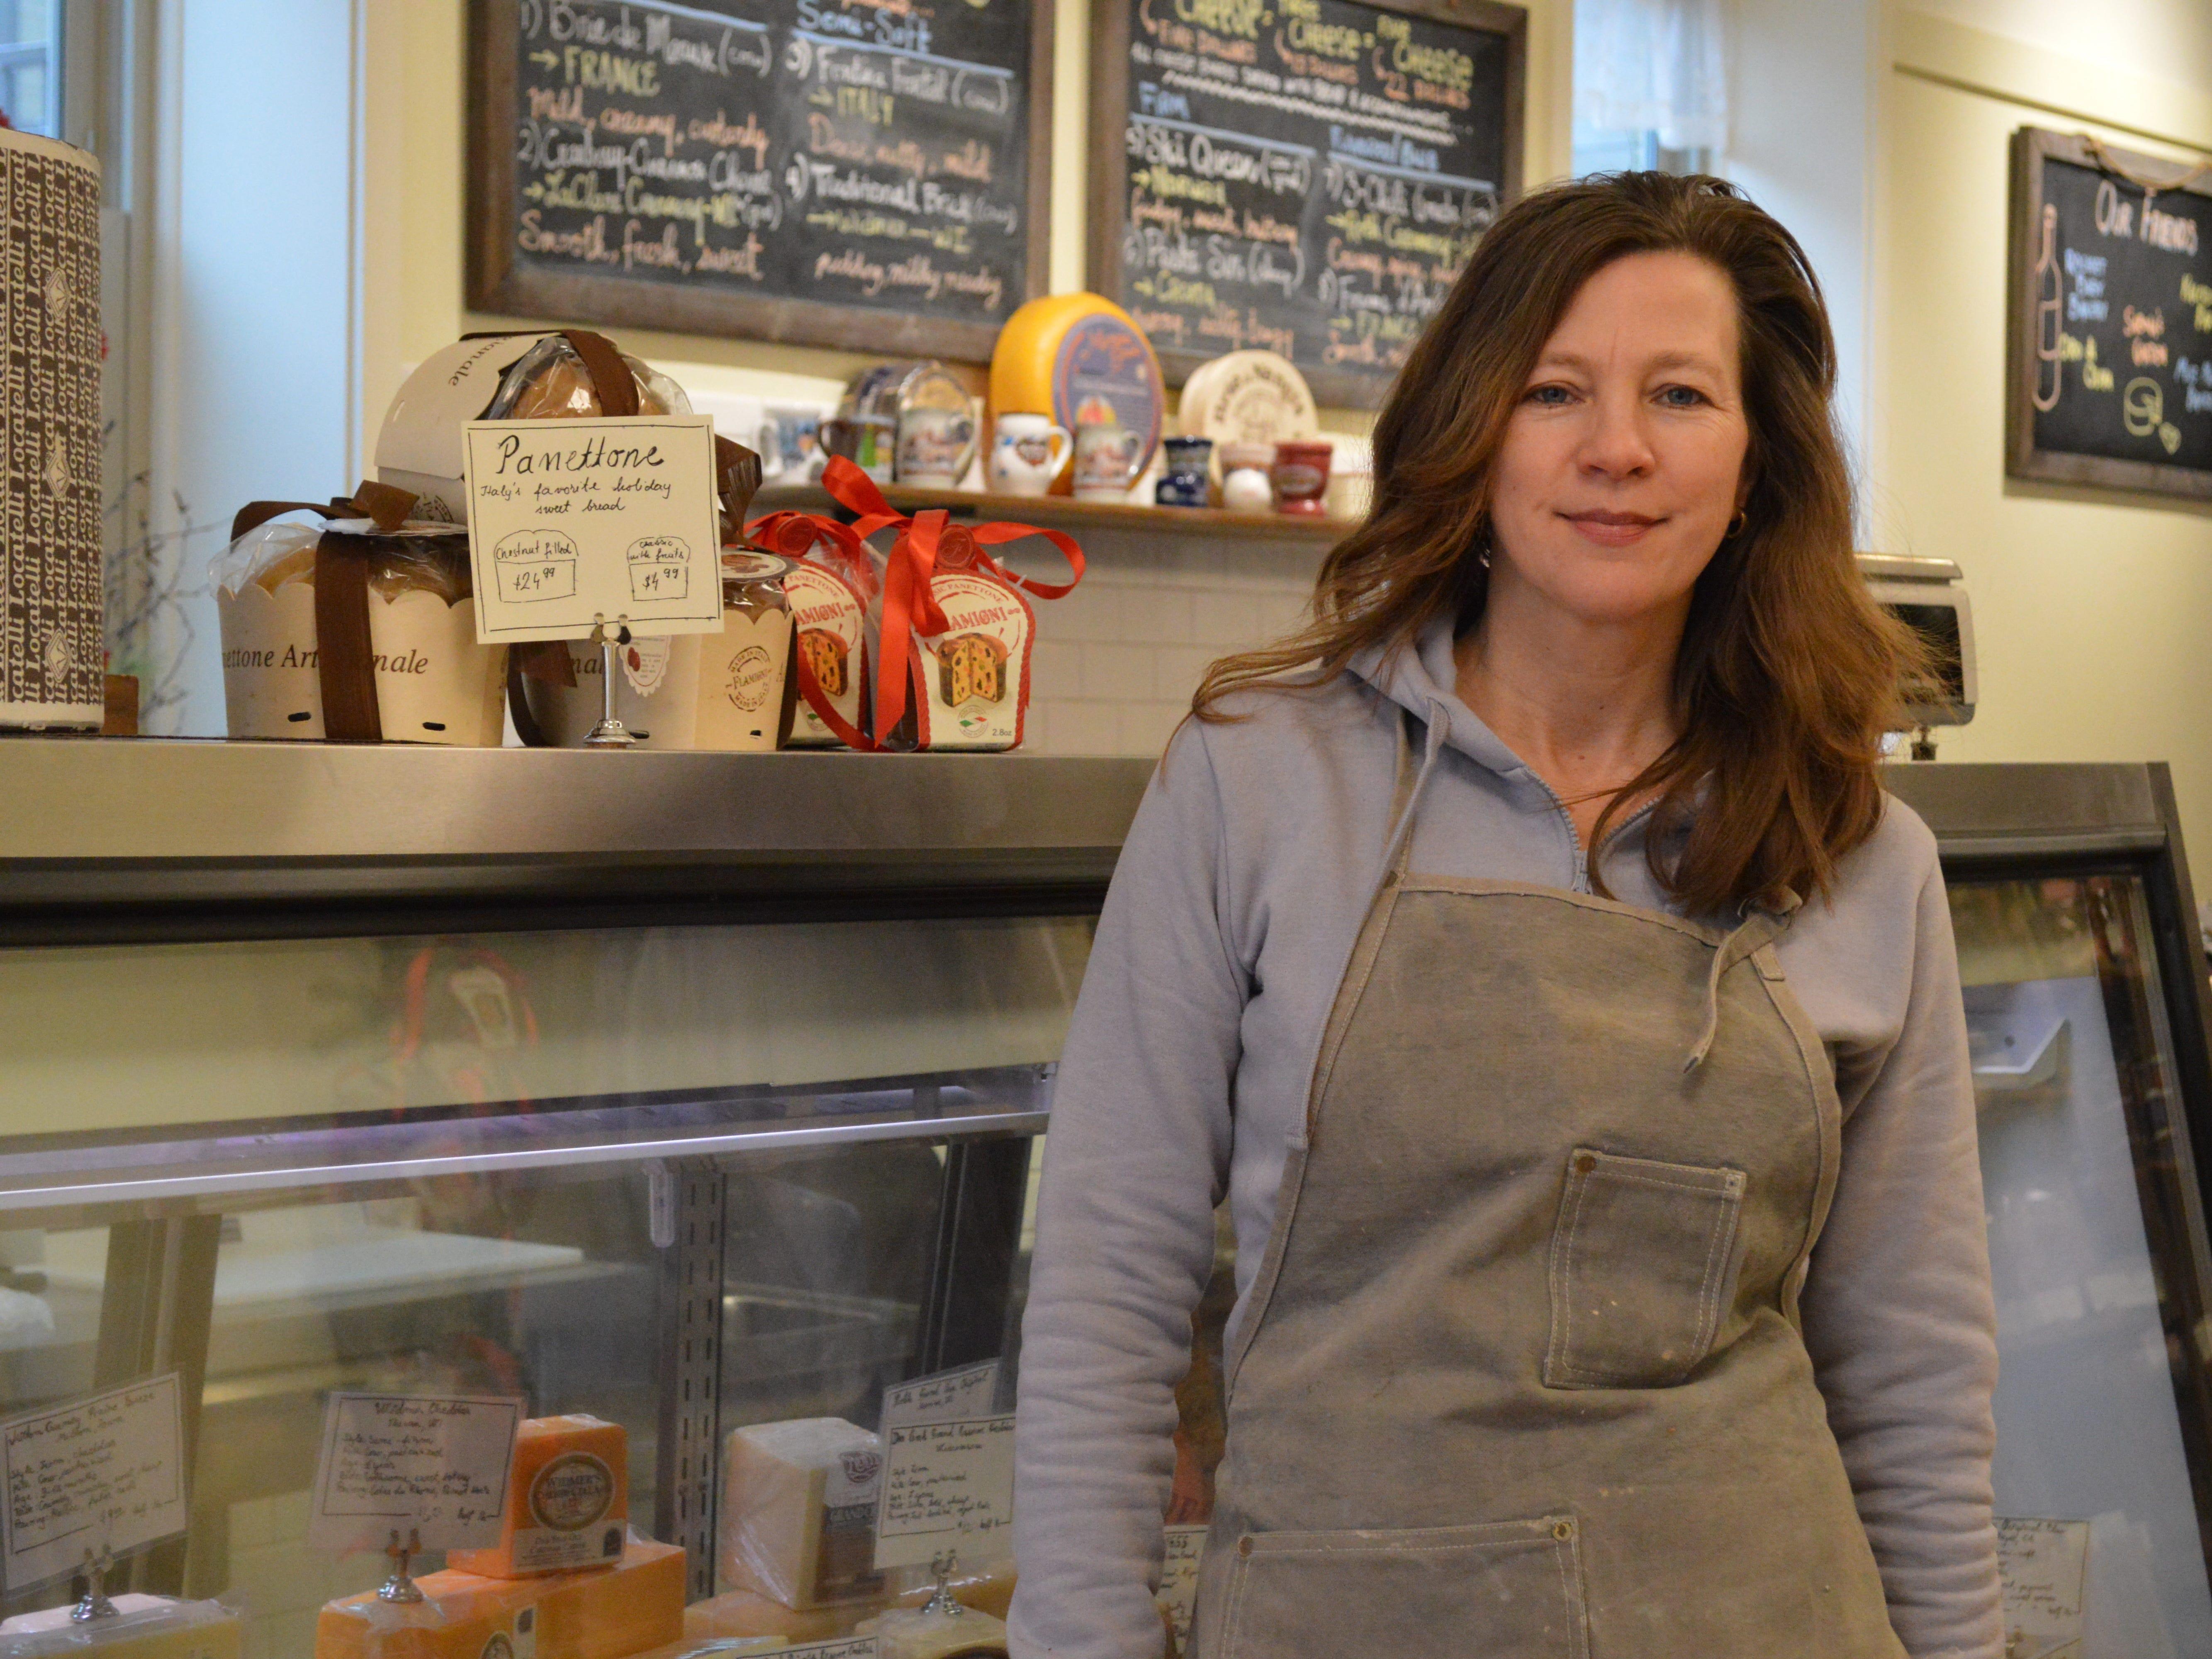 Sabina Magyar opened The Village Cheese Shop in Wauwatosa in 2017.